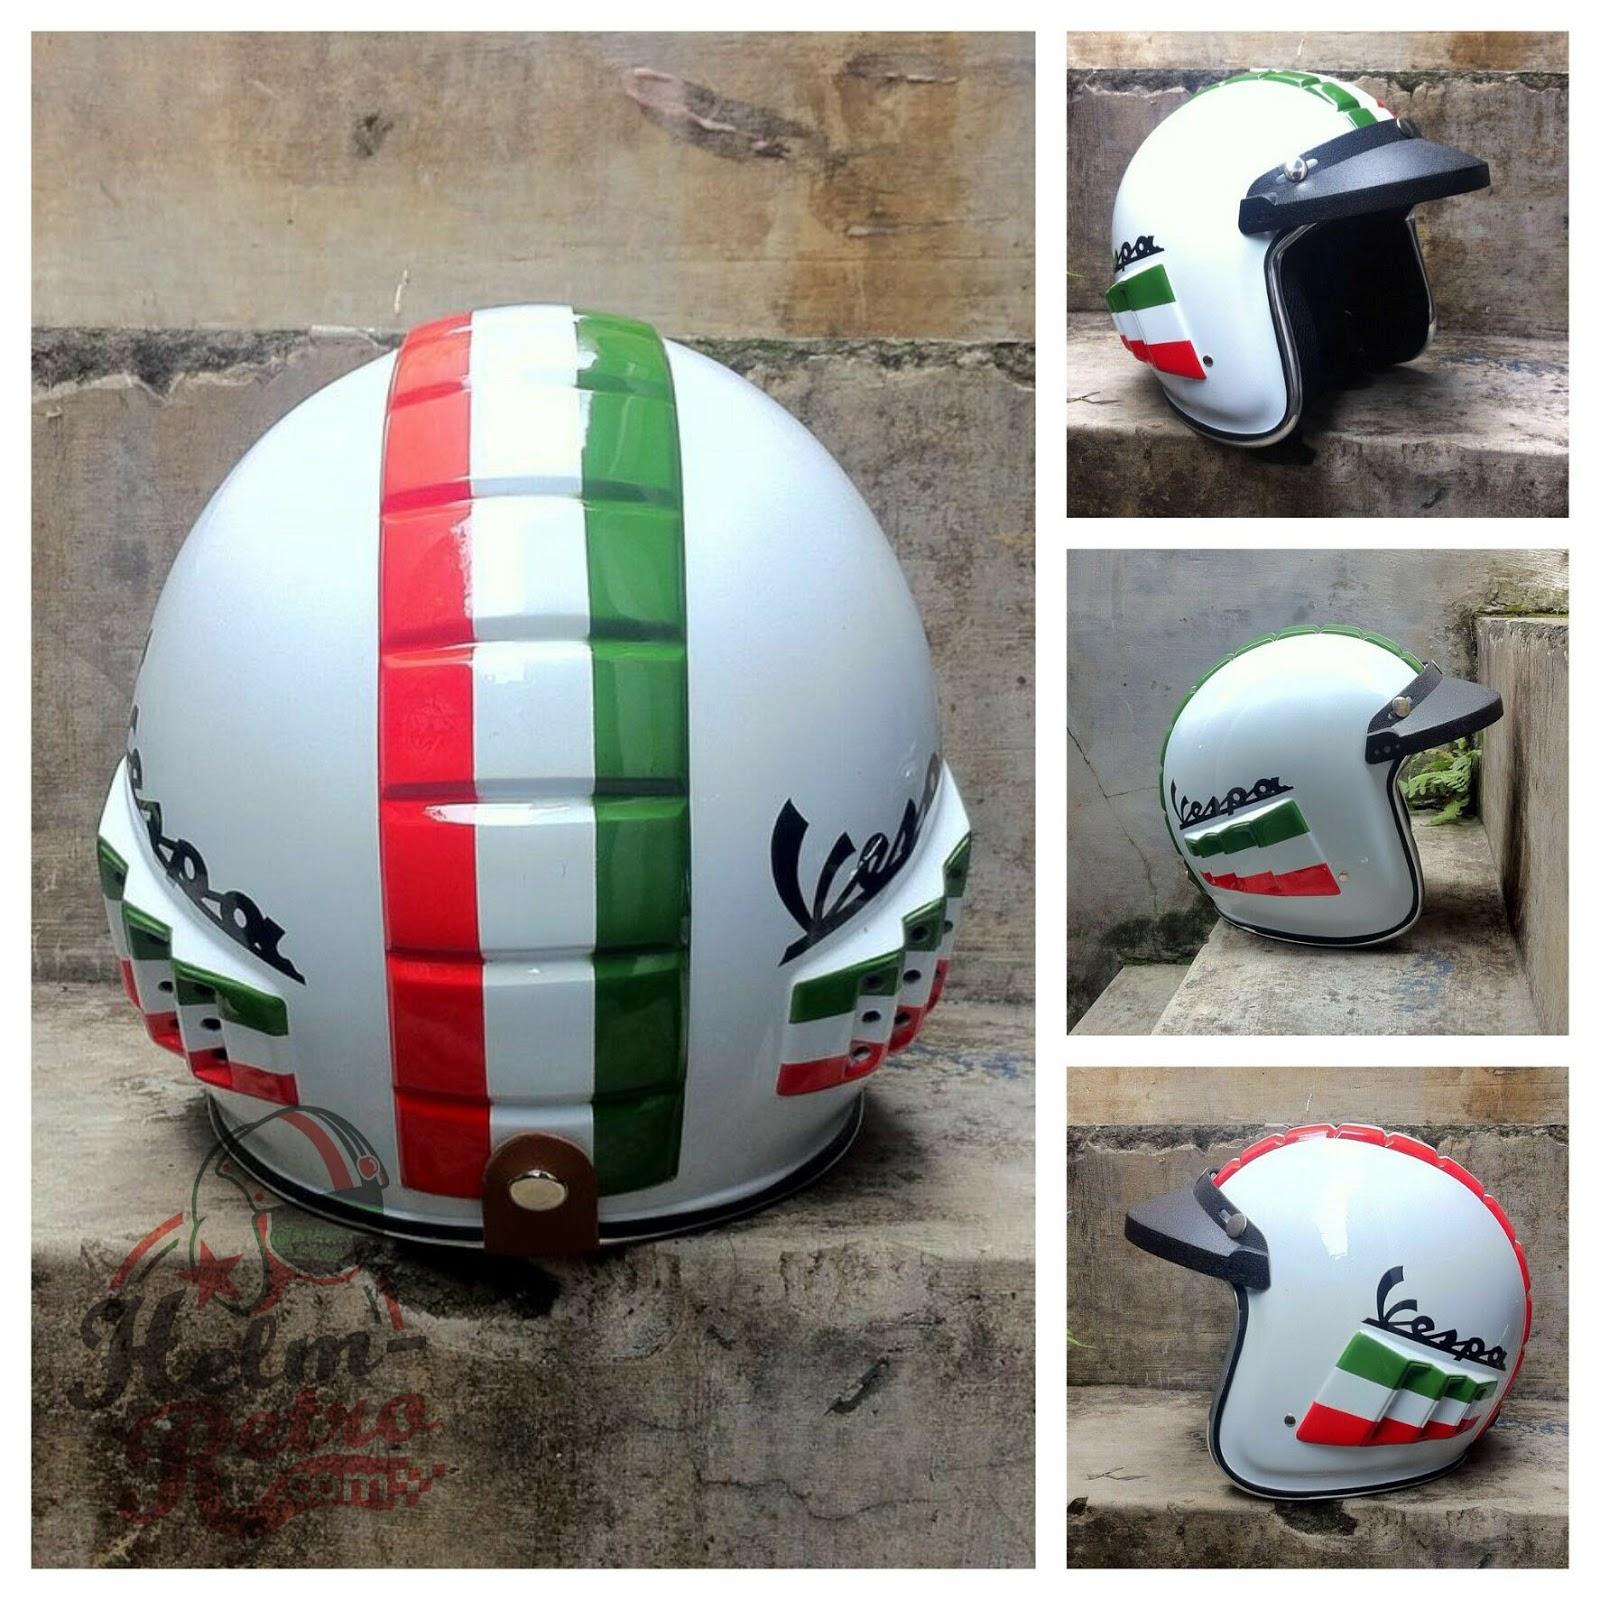 Helm Retro Helm Retro Pilot Helm Retro Bogo Helm Robot Vespa